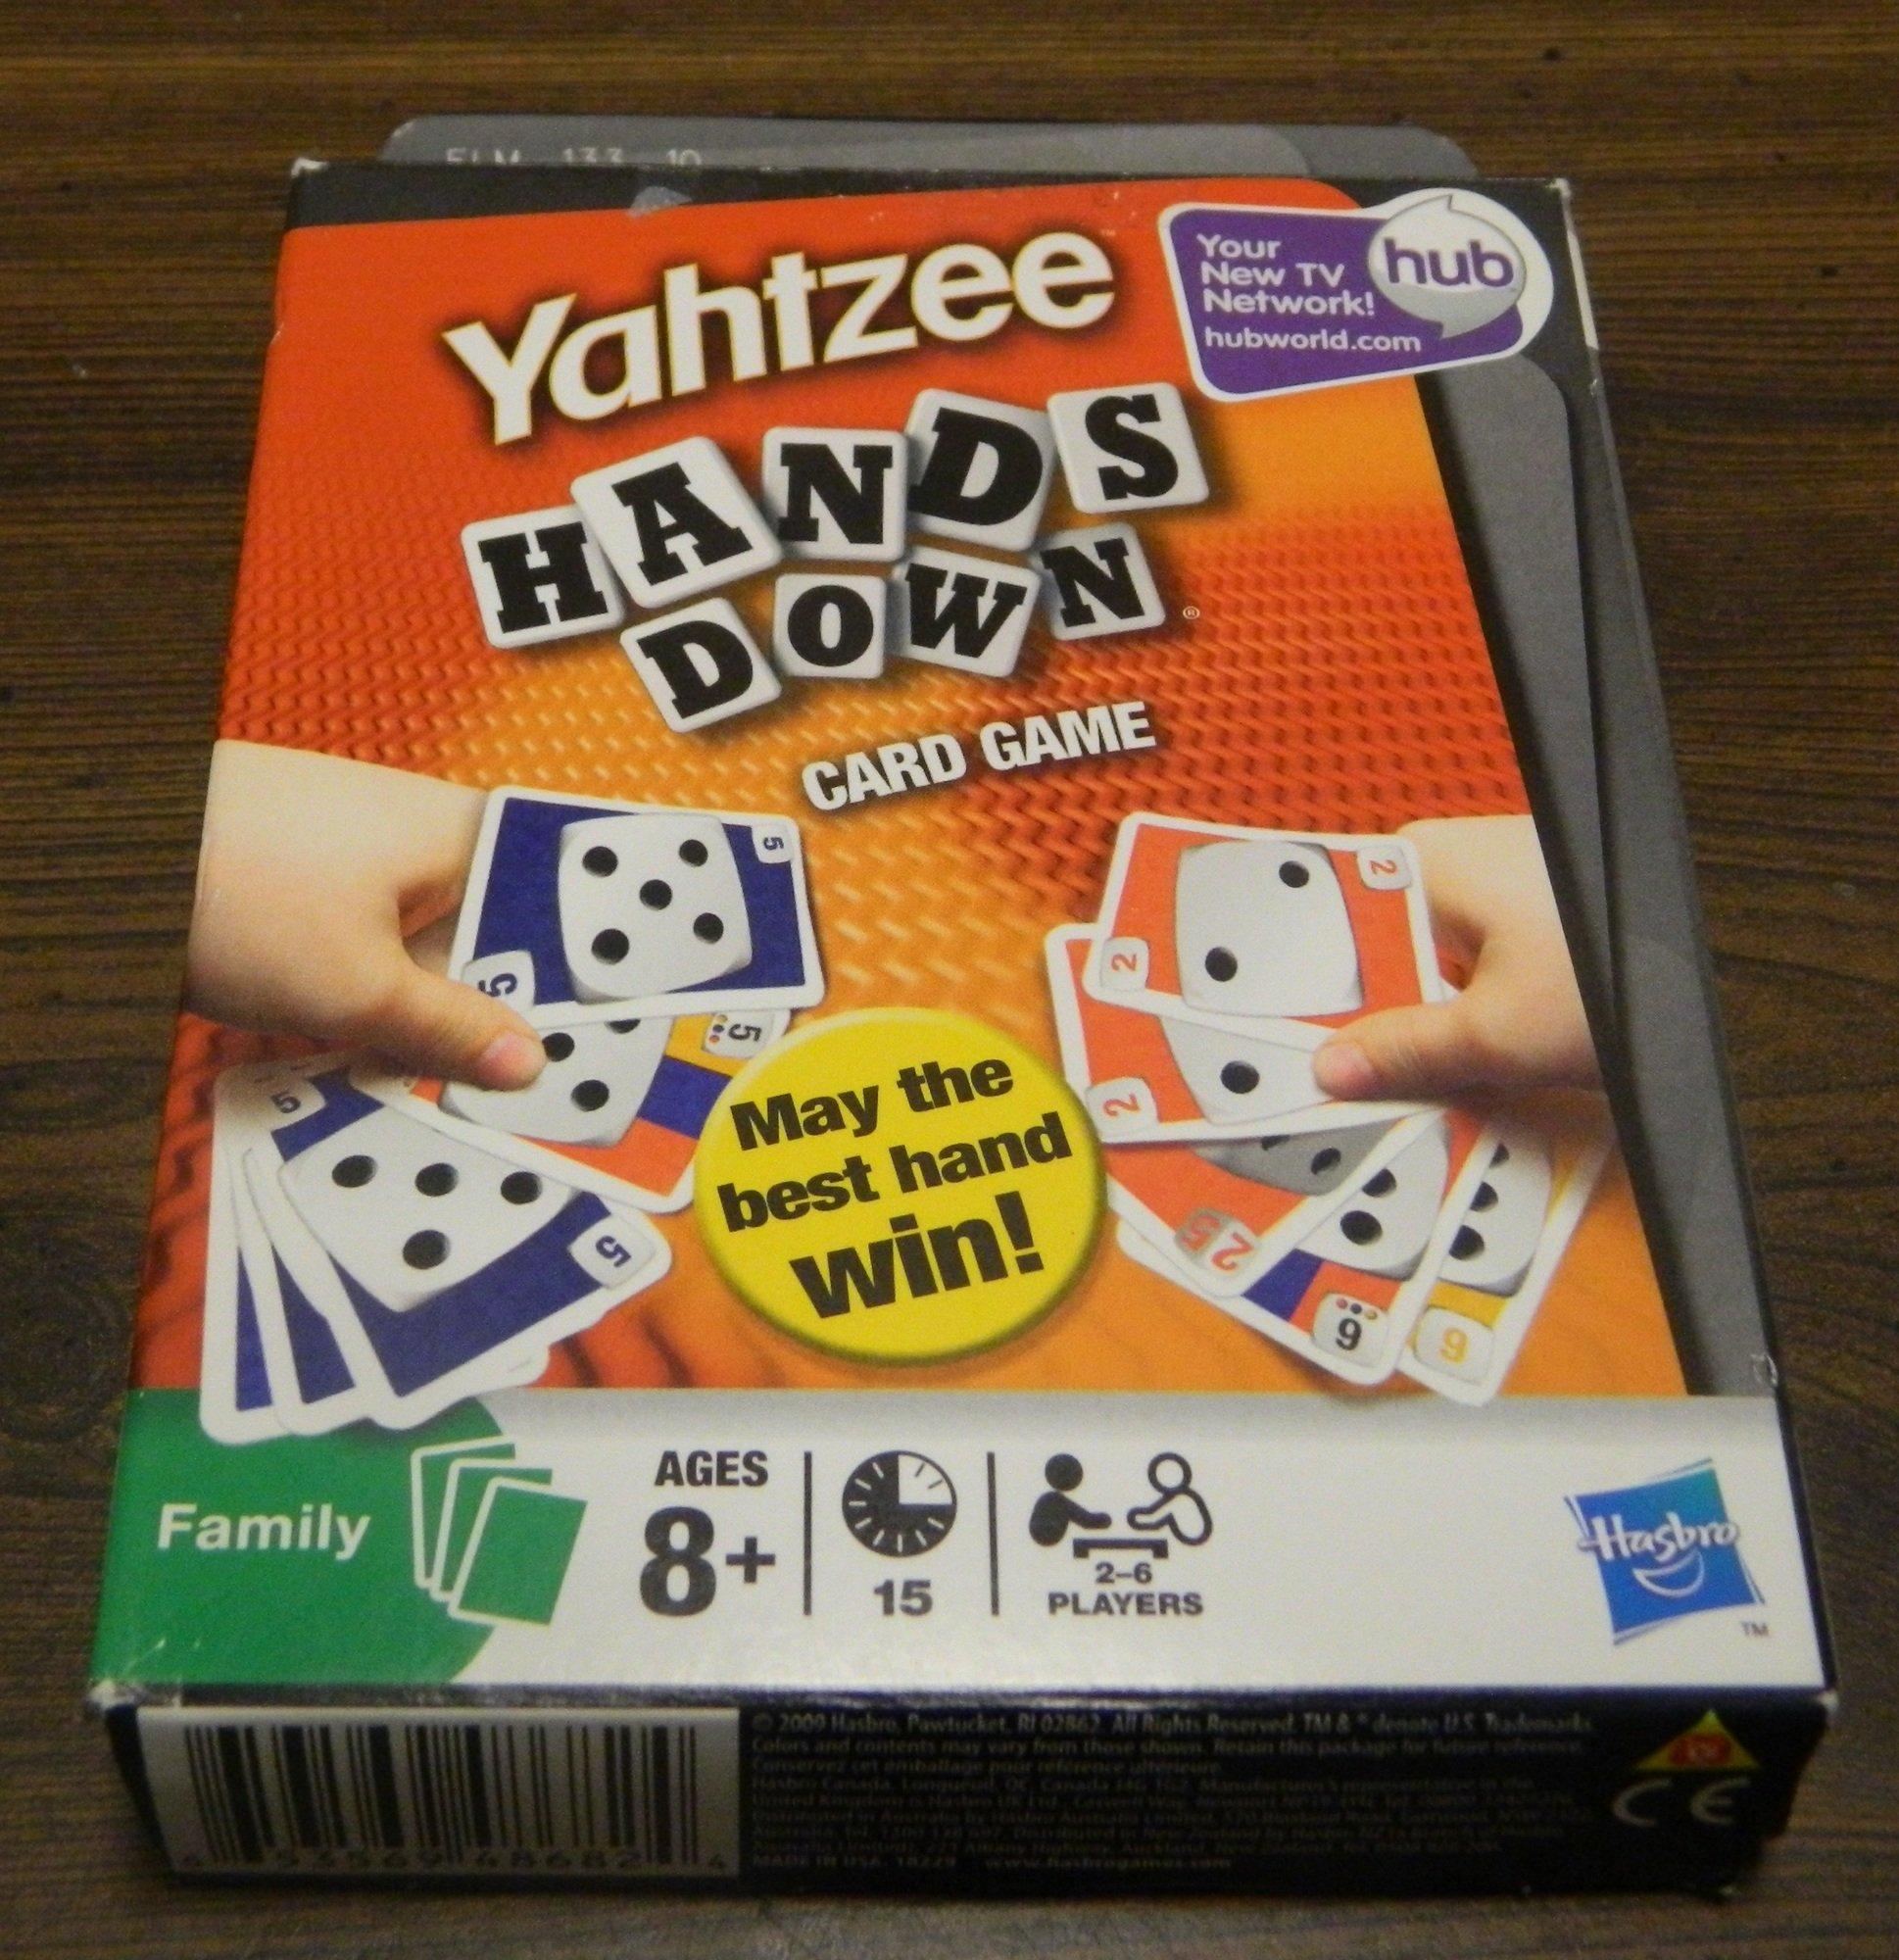 Box for Yahtzee Hands Down